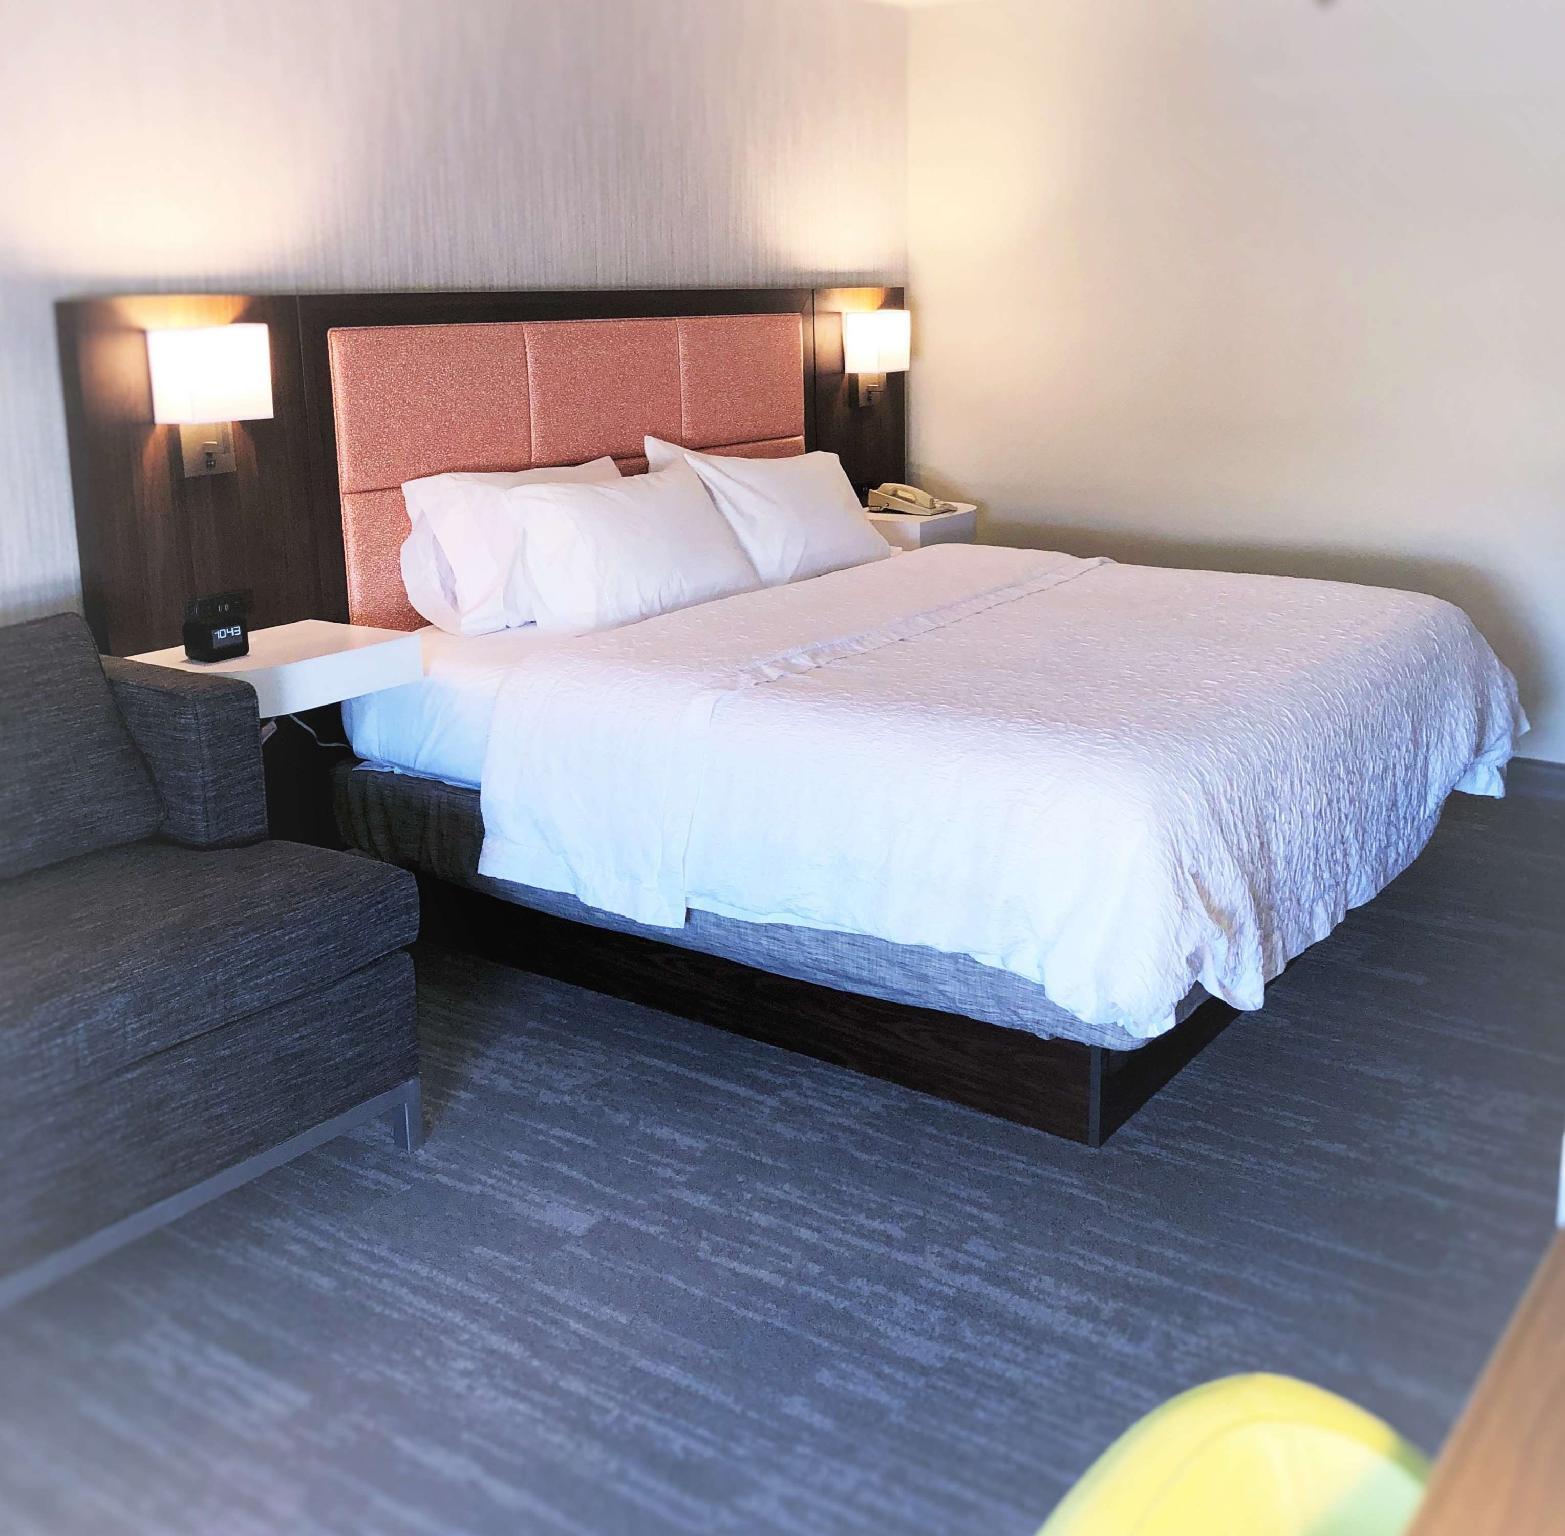 Hampton Inn Williamsport Downtown Hotel Williamsport Pa Deals Photos Reviews